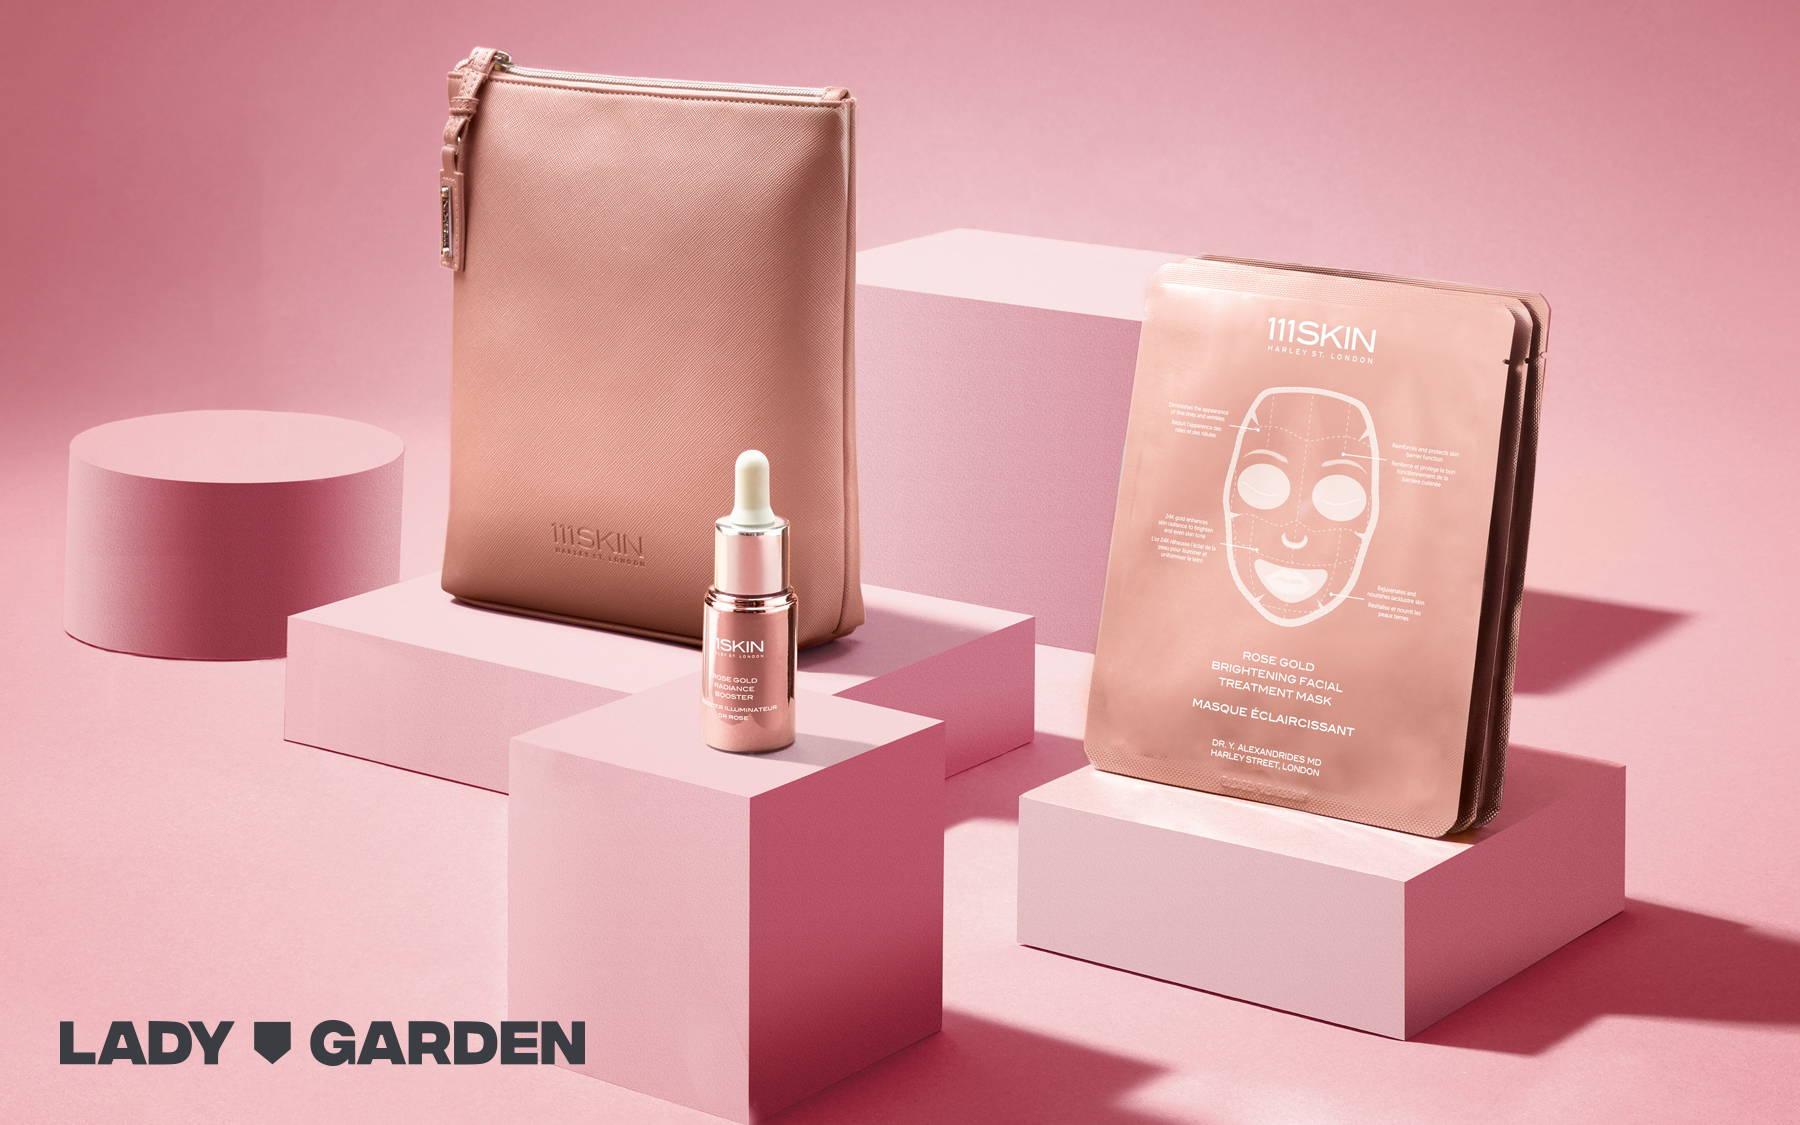 111SKIN X Lady Garden Foundation